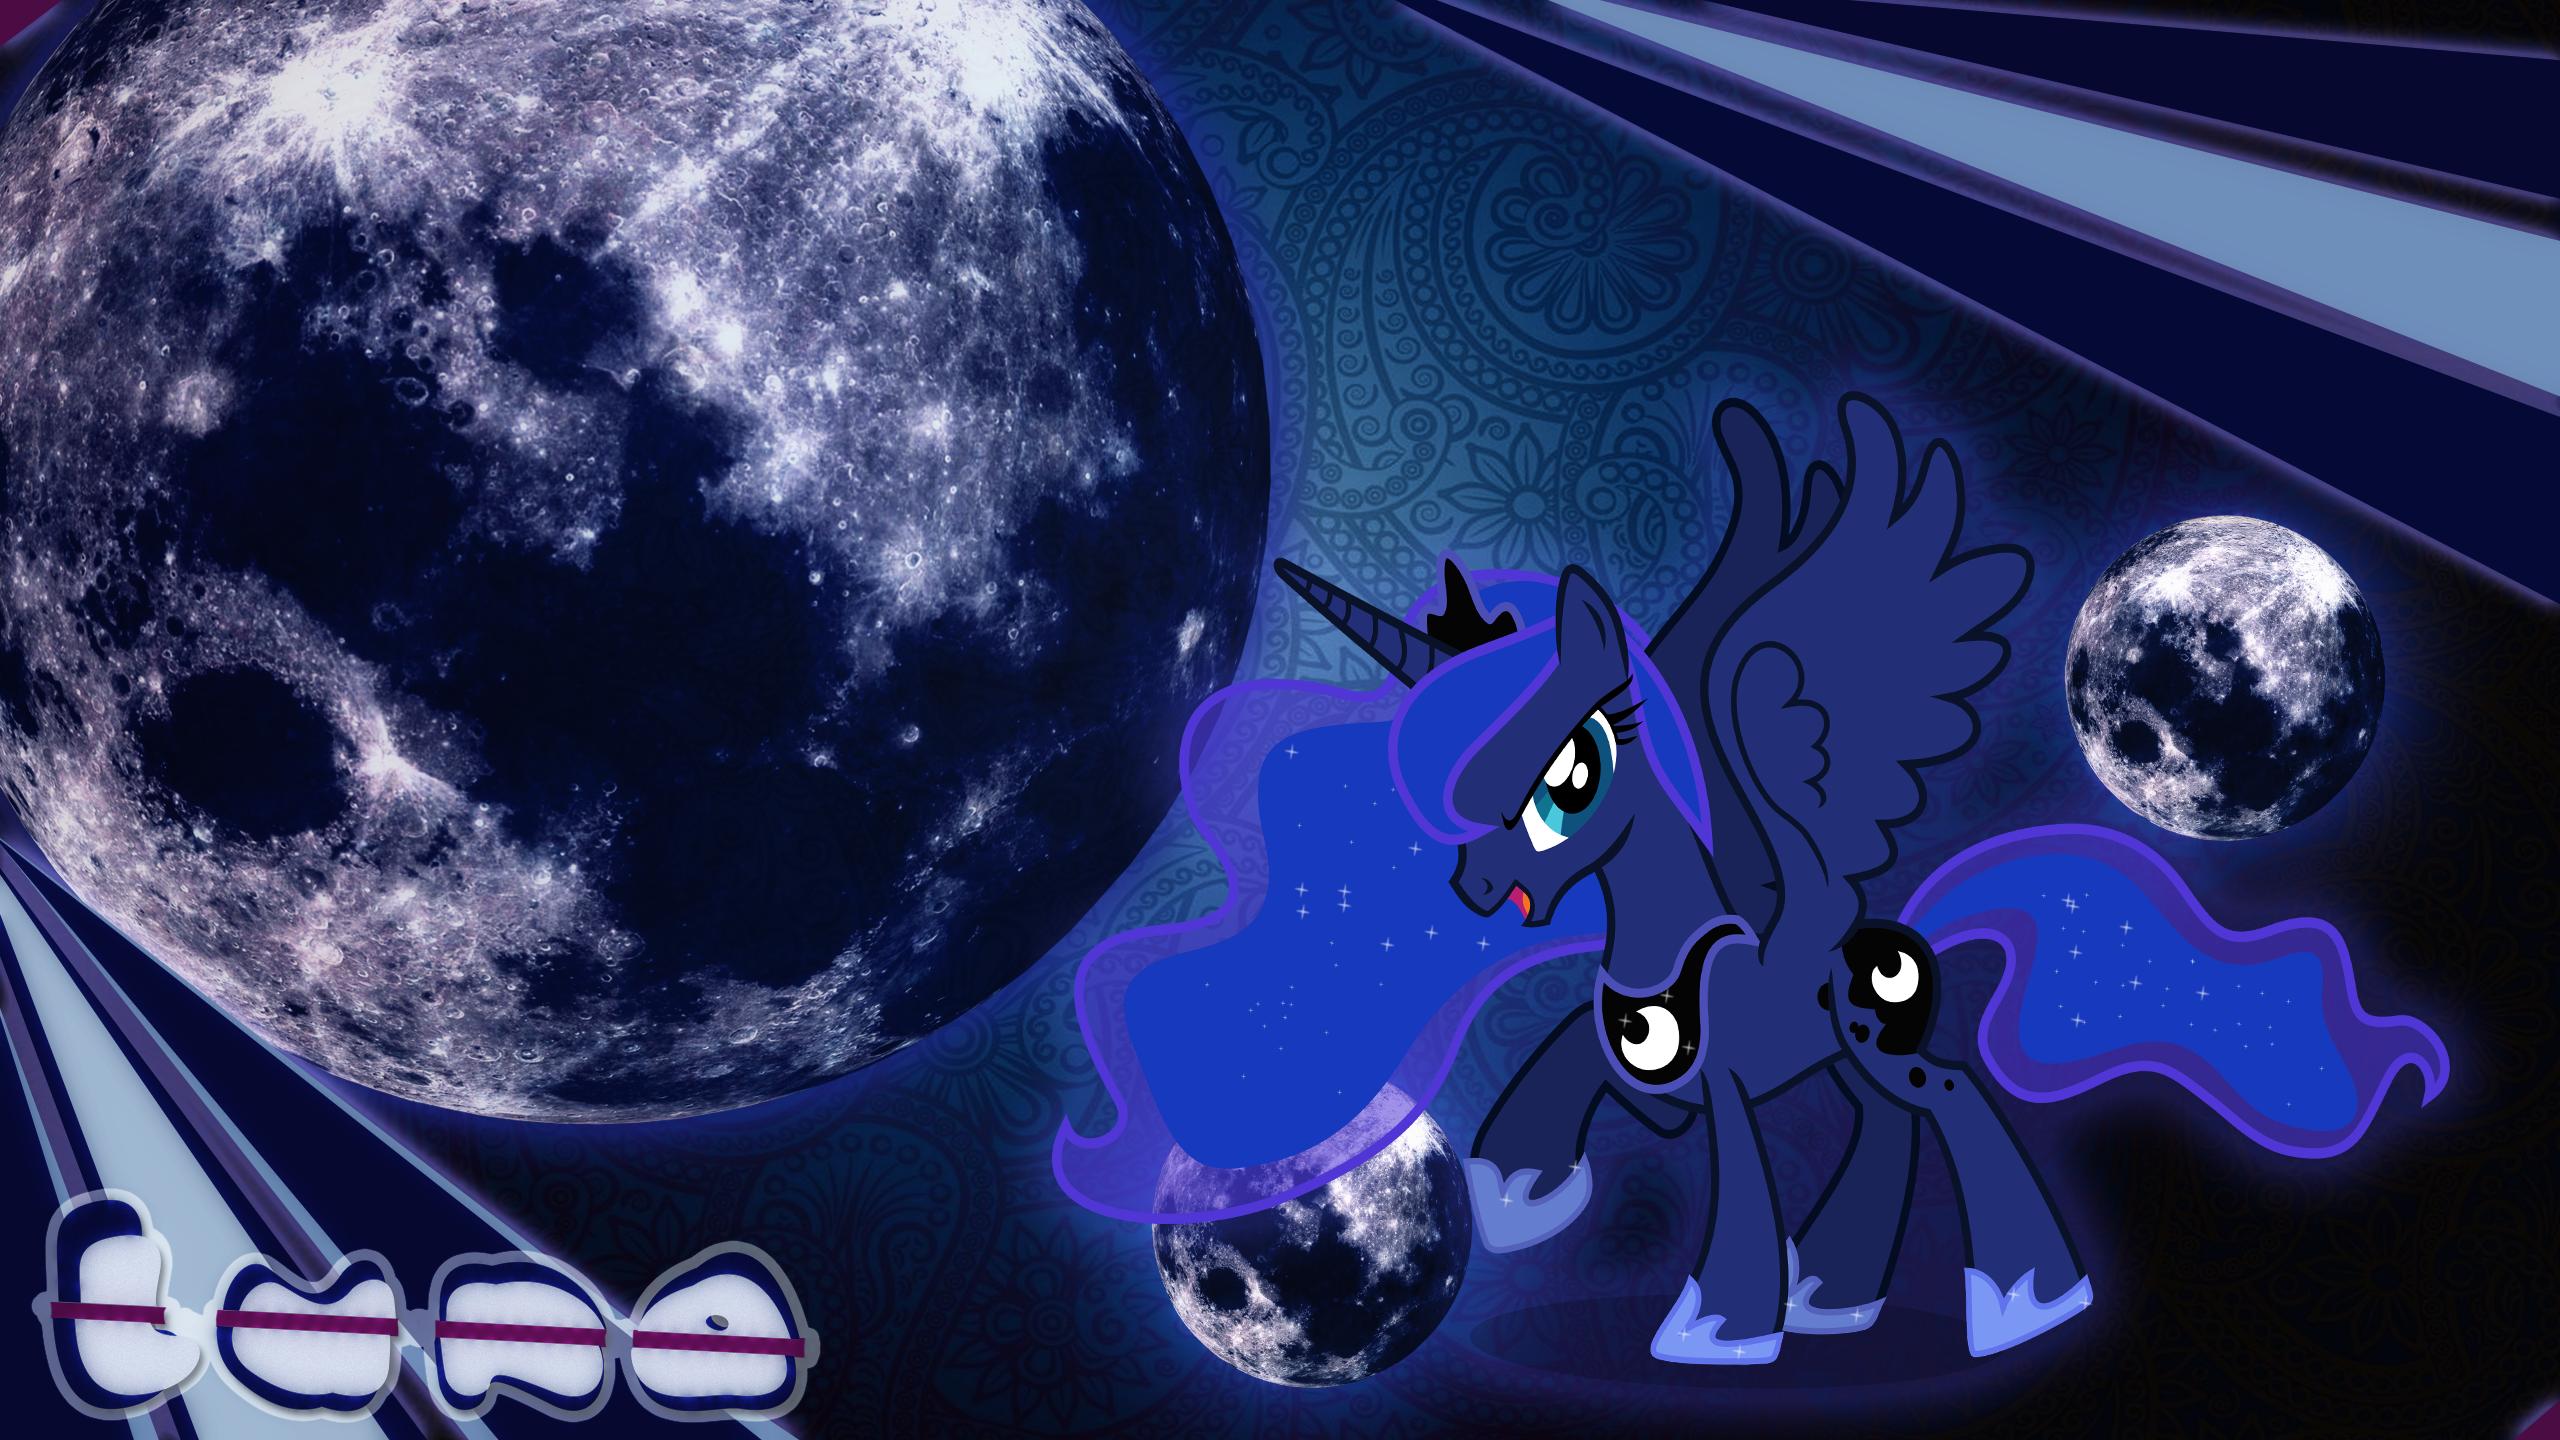 Luna wallpaper by skrayp